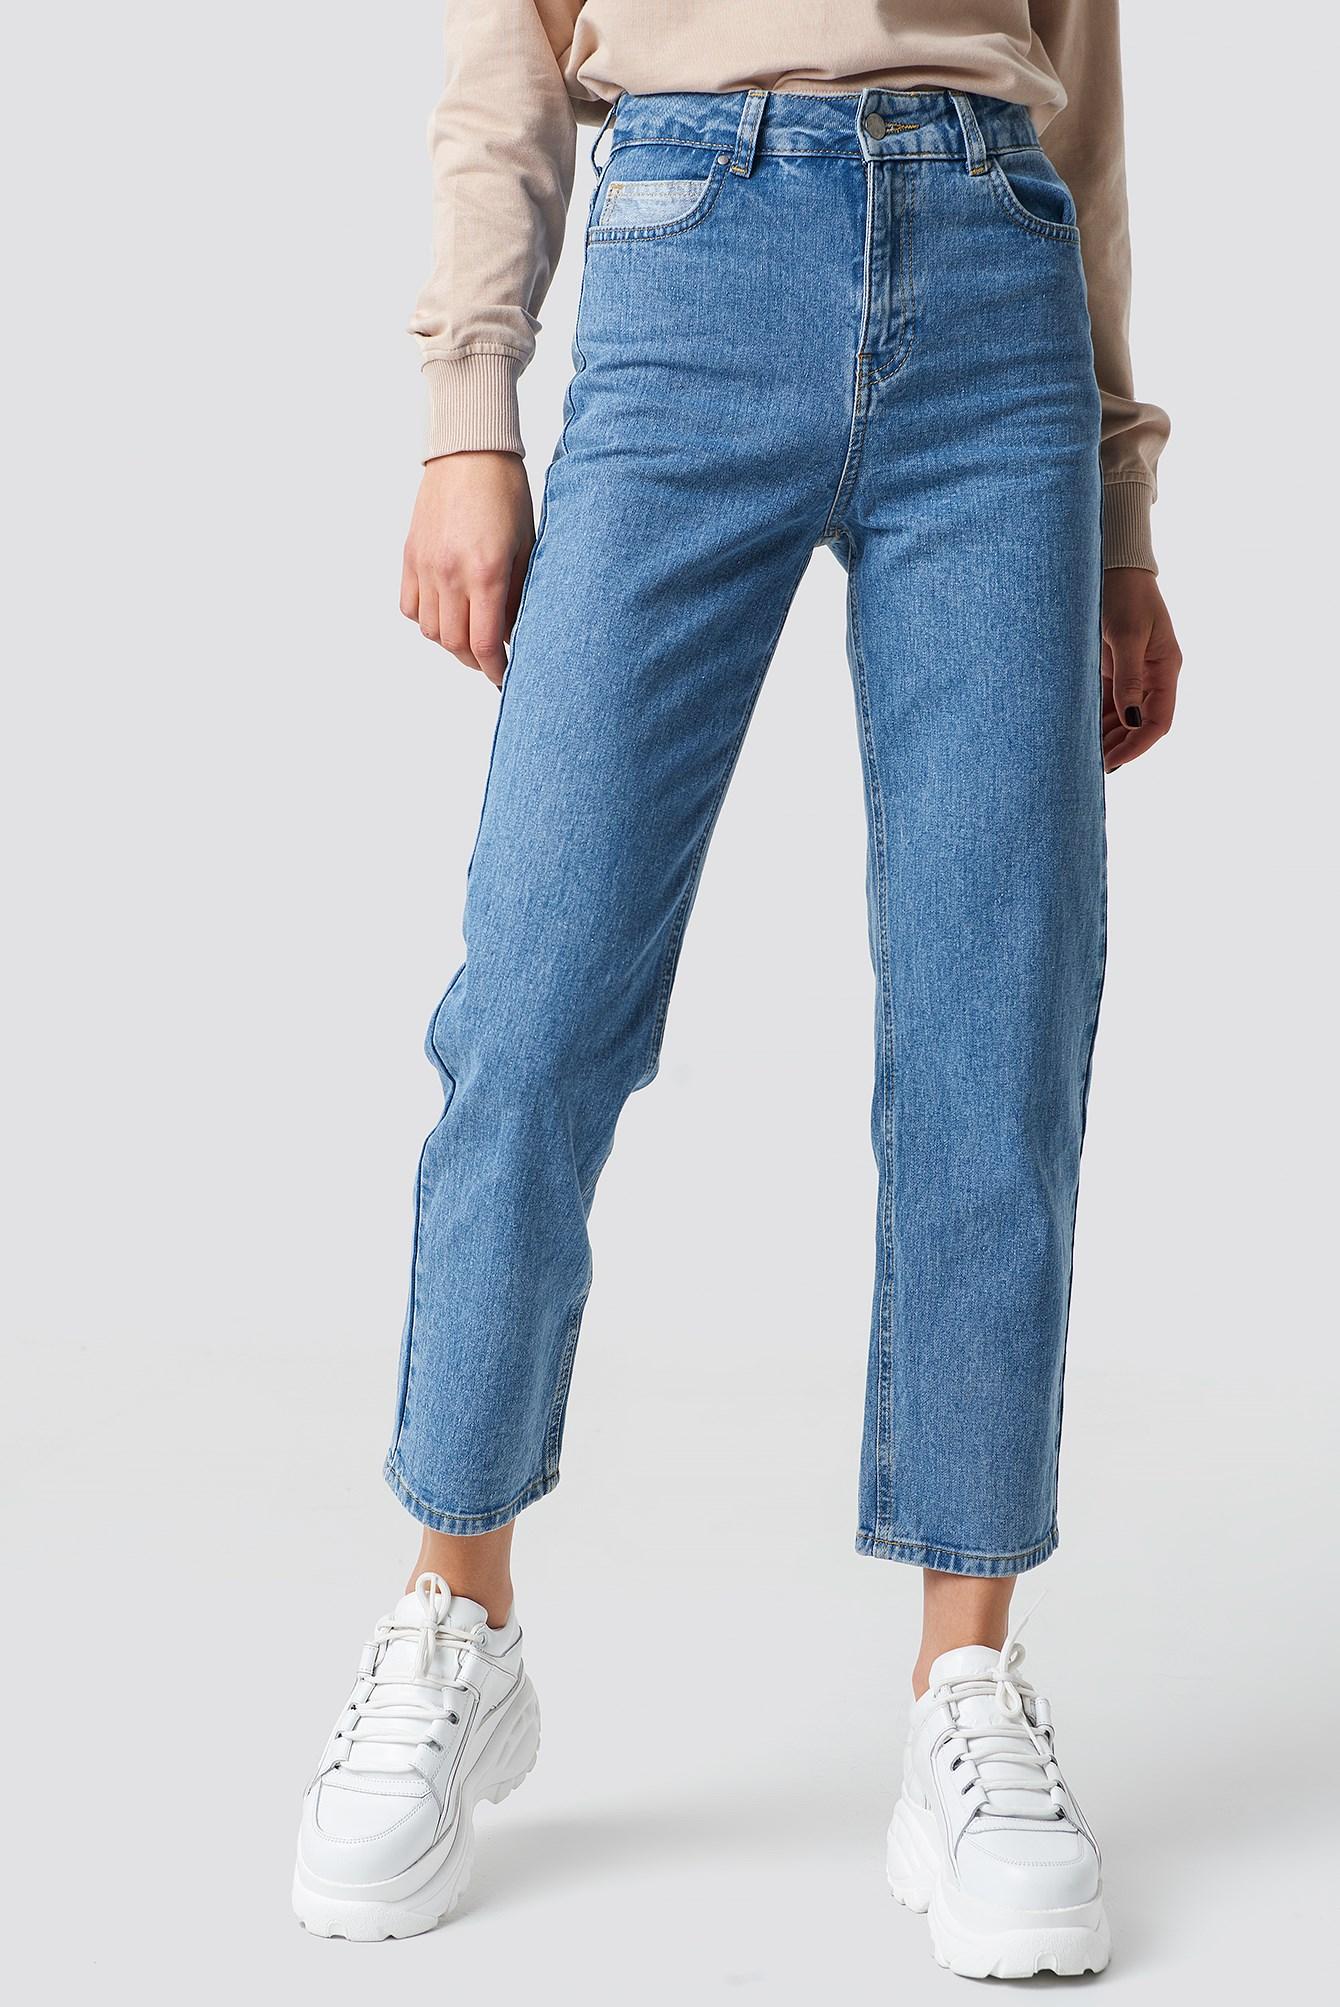 Straight Leg Blue Jeans ,  Astrid Olsen x NA-KD